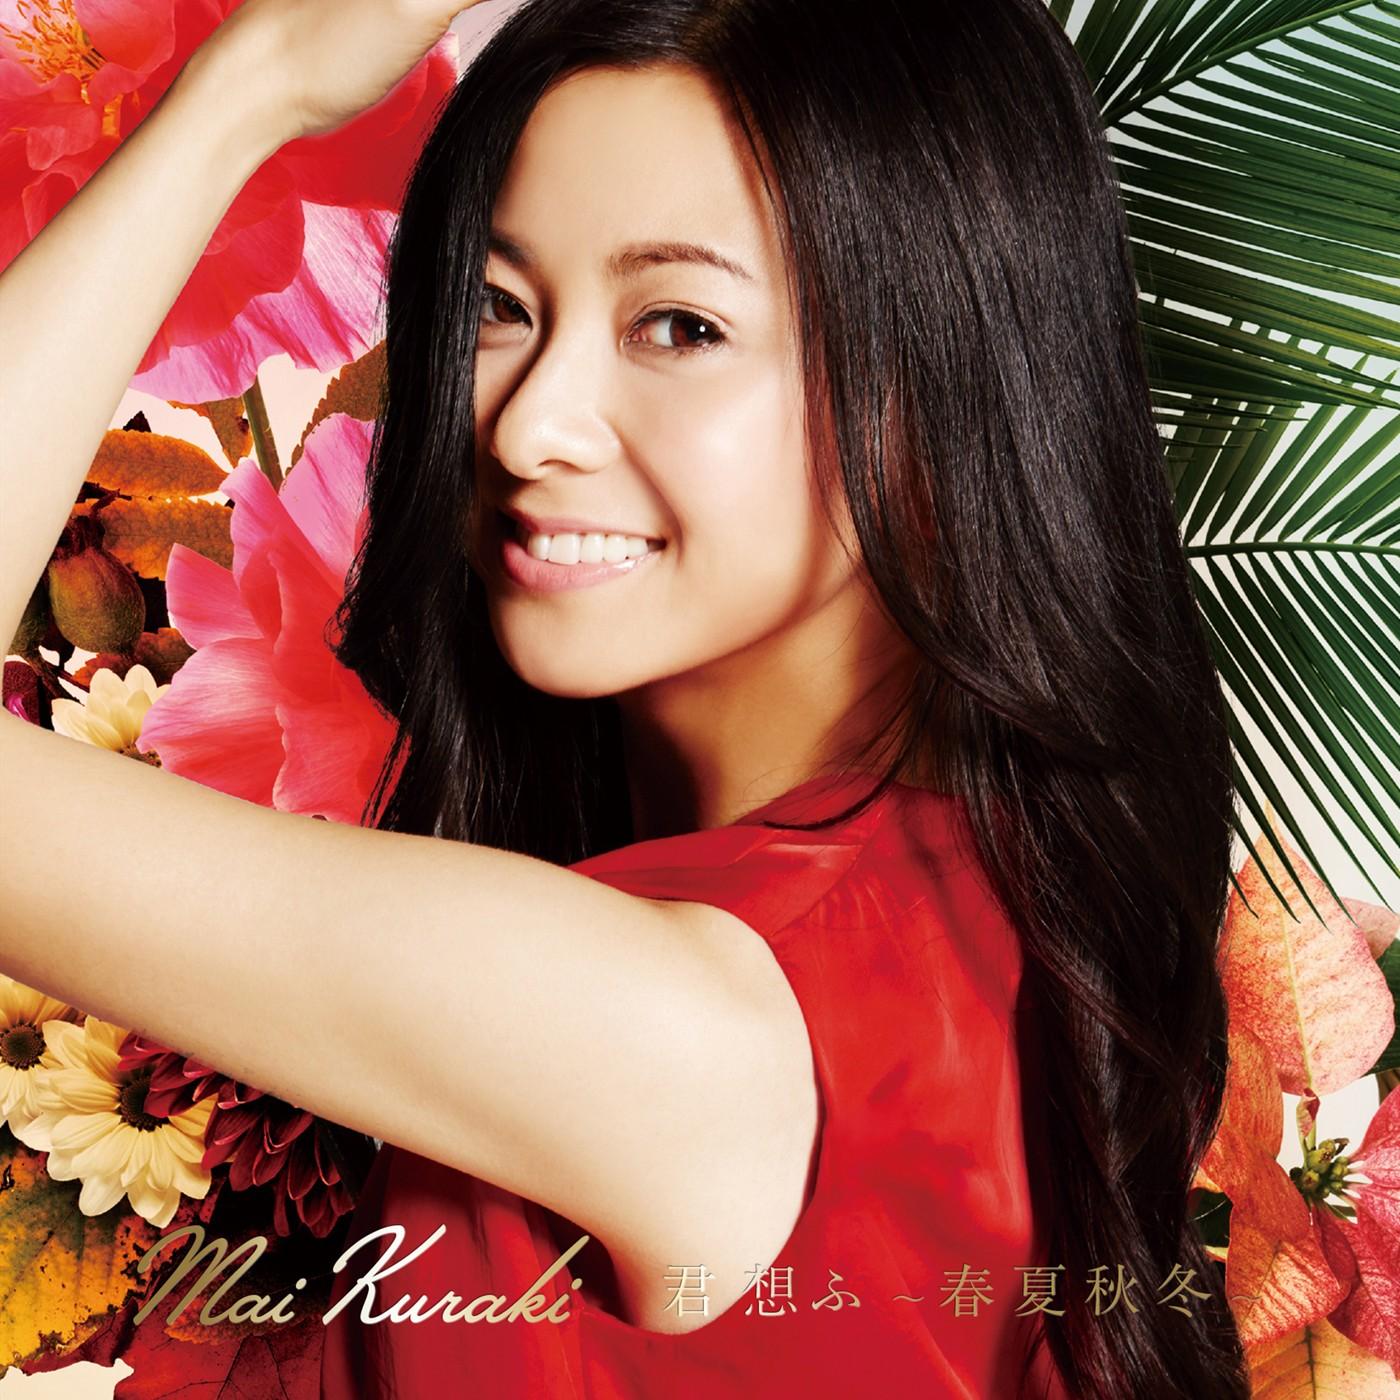 倉木麻衣 (Mai Kuraki) – 君 想ふ ~春夏秋冬~ [FLAC + AAC 256 + DVD ISO] [2018.10.10]